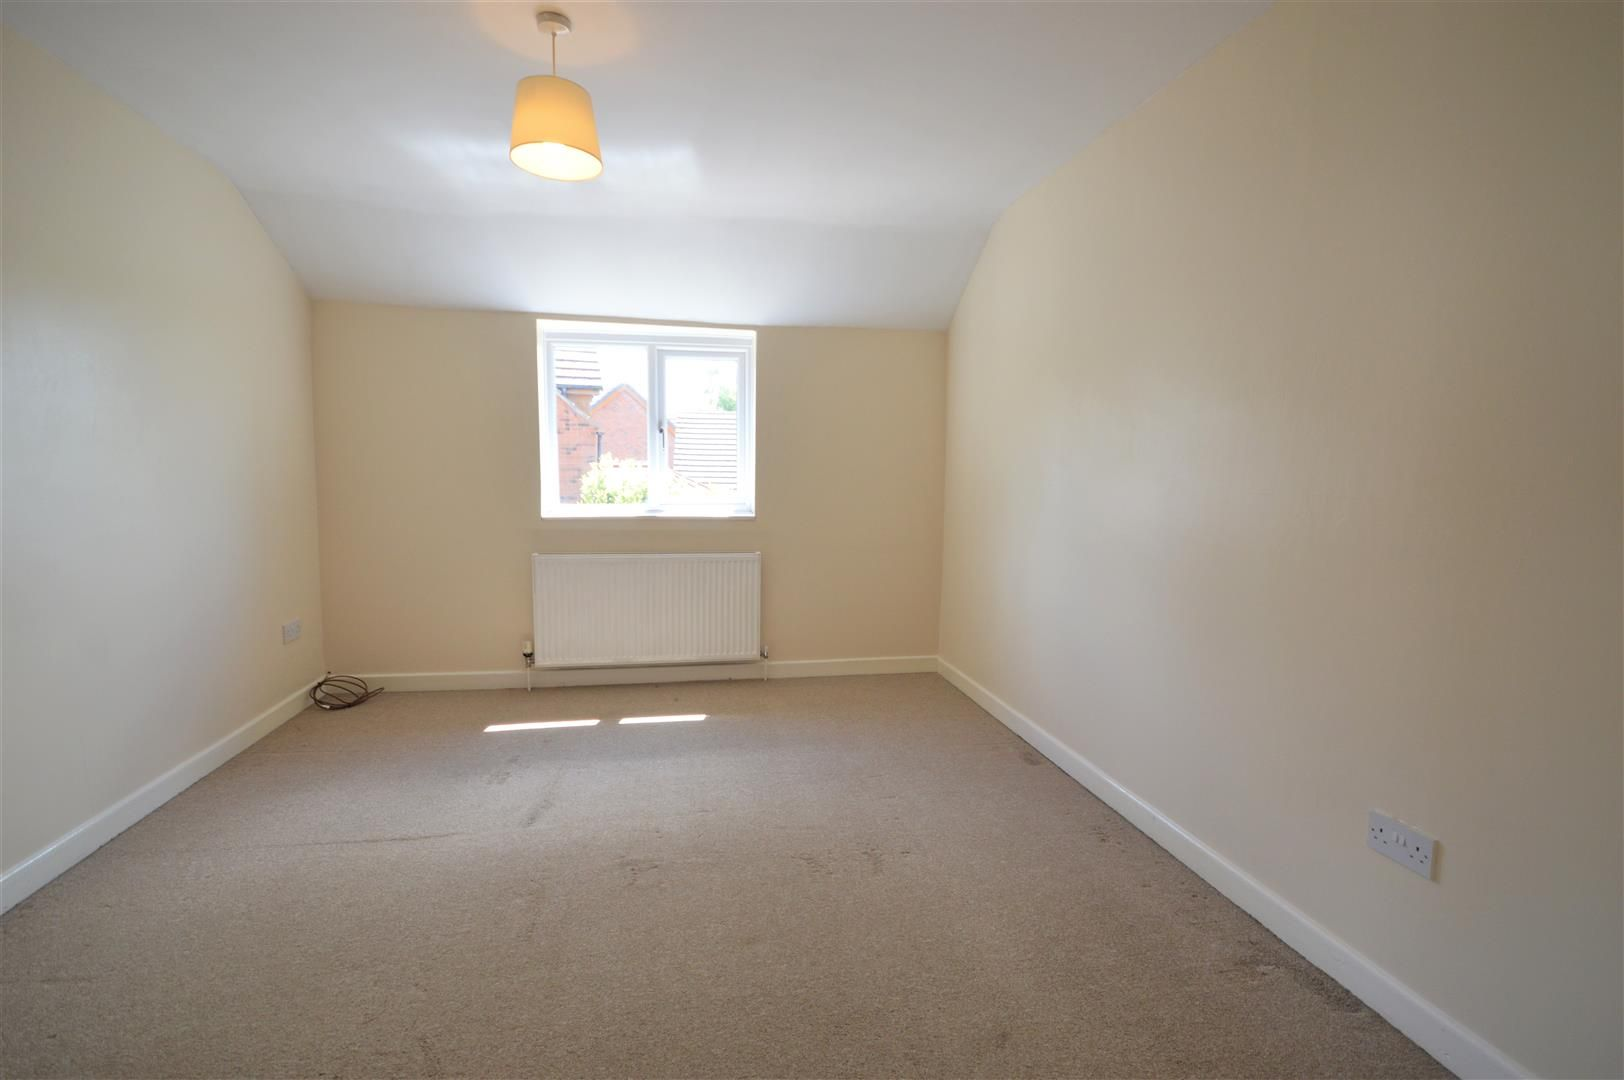 2 bed semi-detached for sale in Kingsland 5